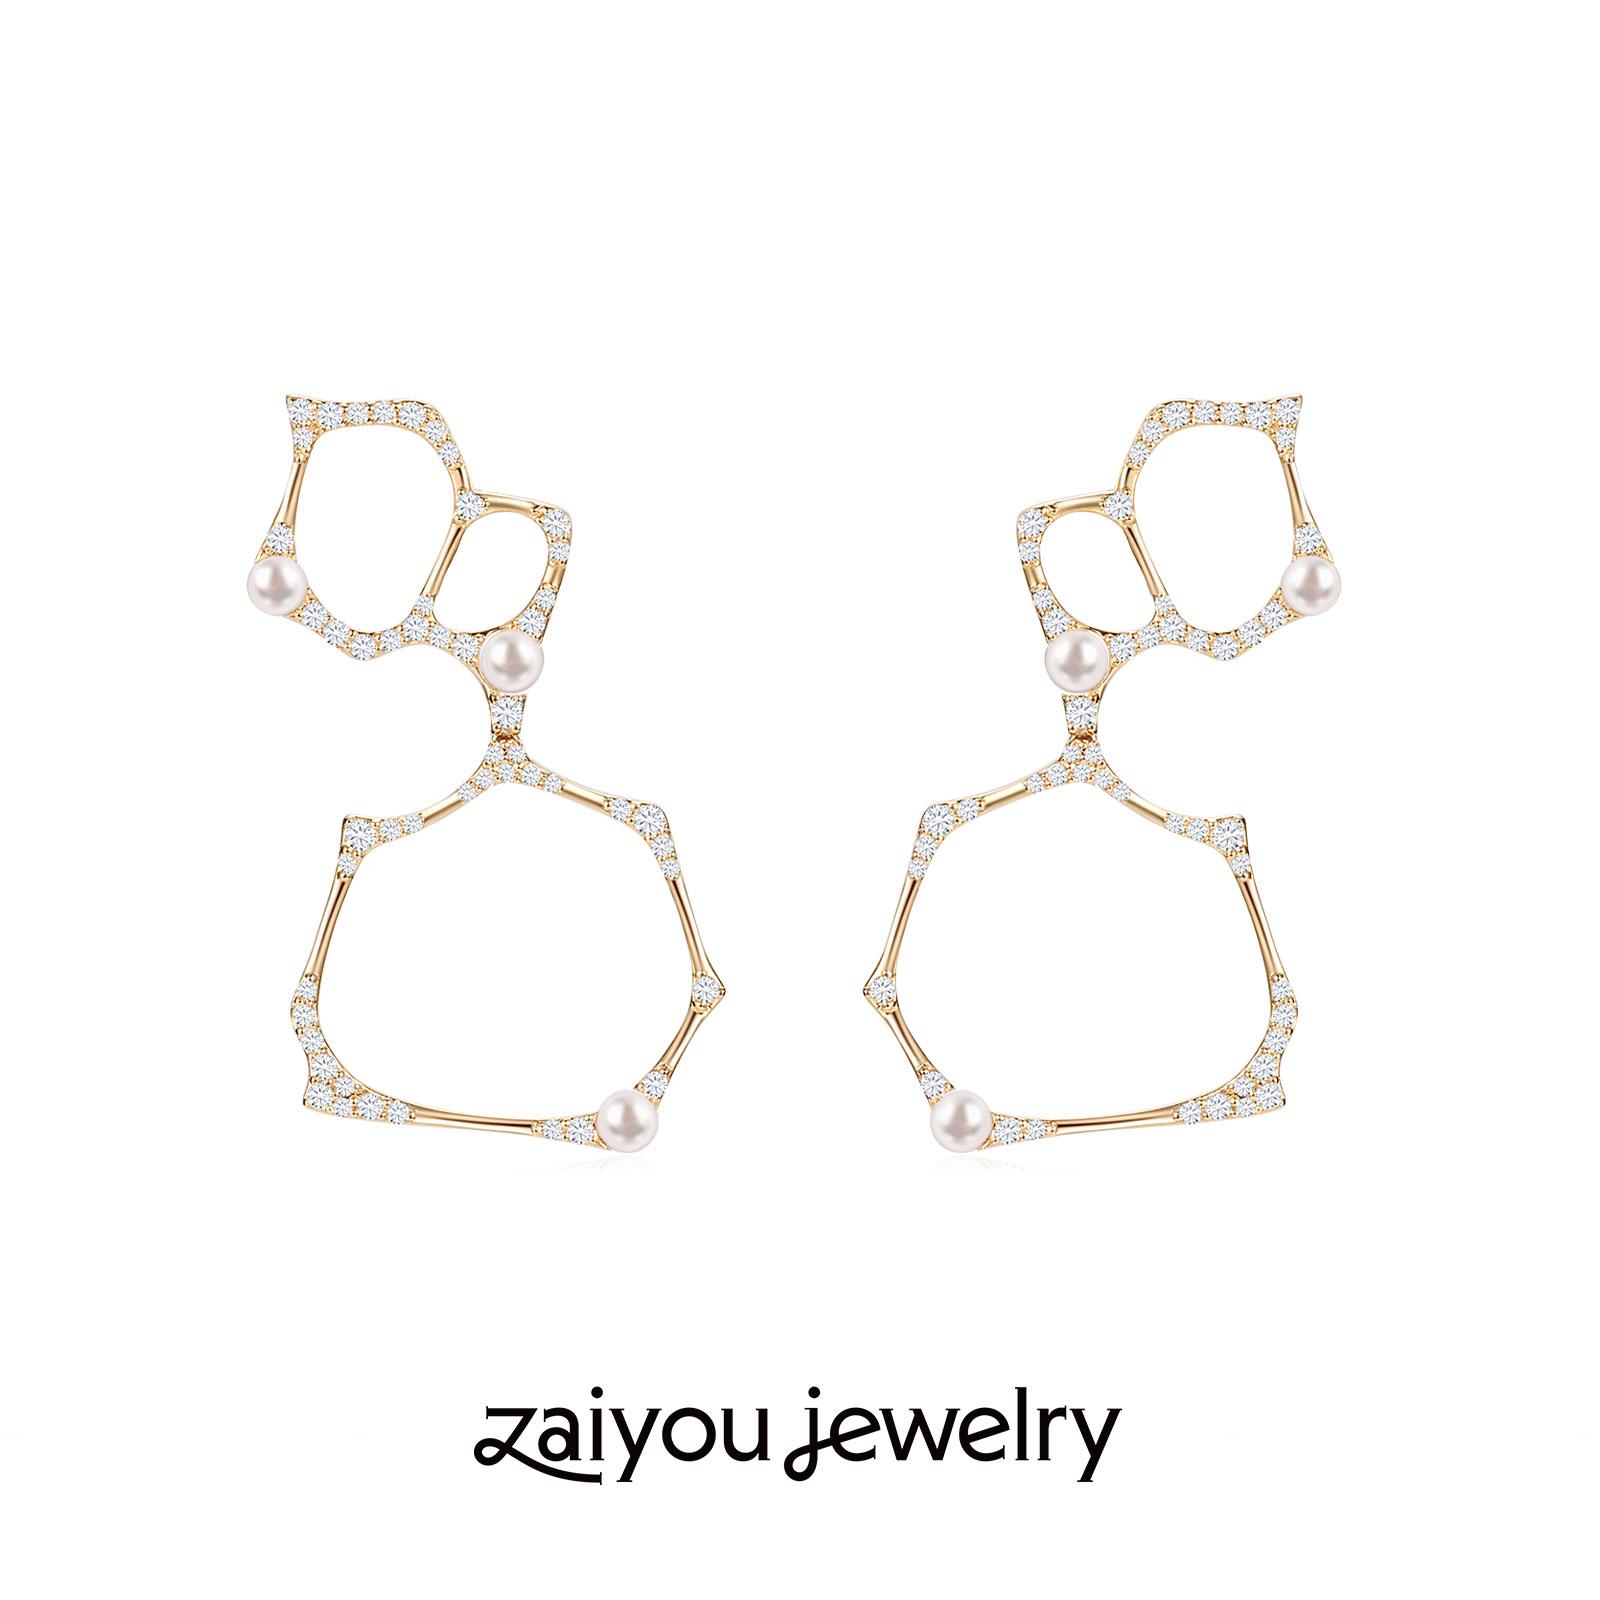 [surface tension] Qi Yue Yus K gold Akoya pearl artificial diamond three bubble Earrings